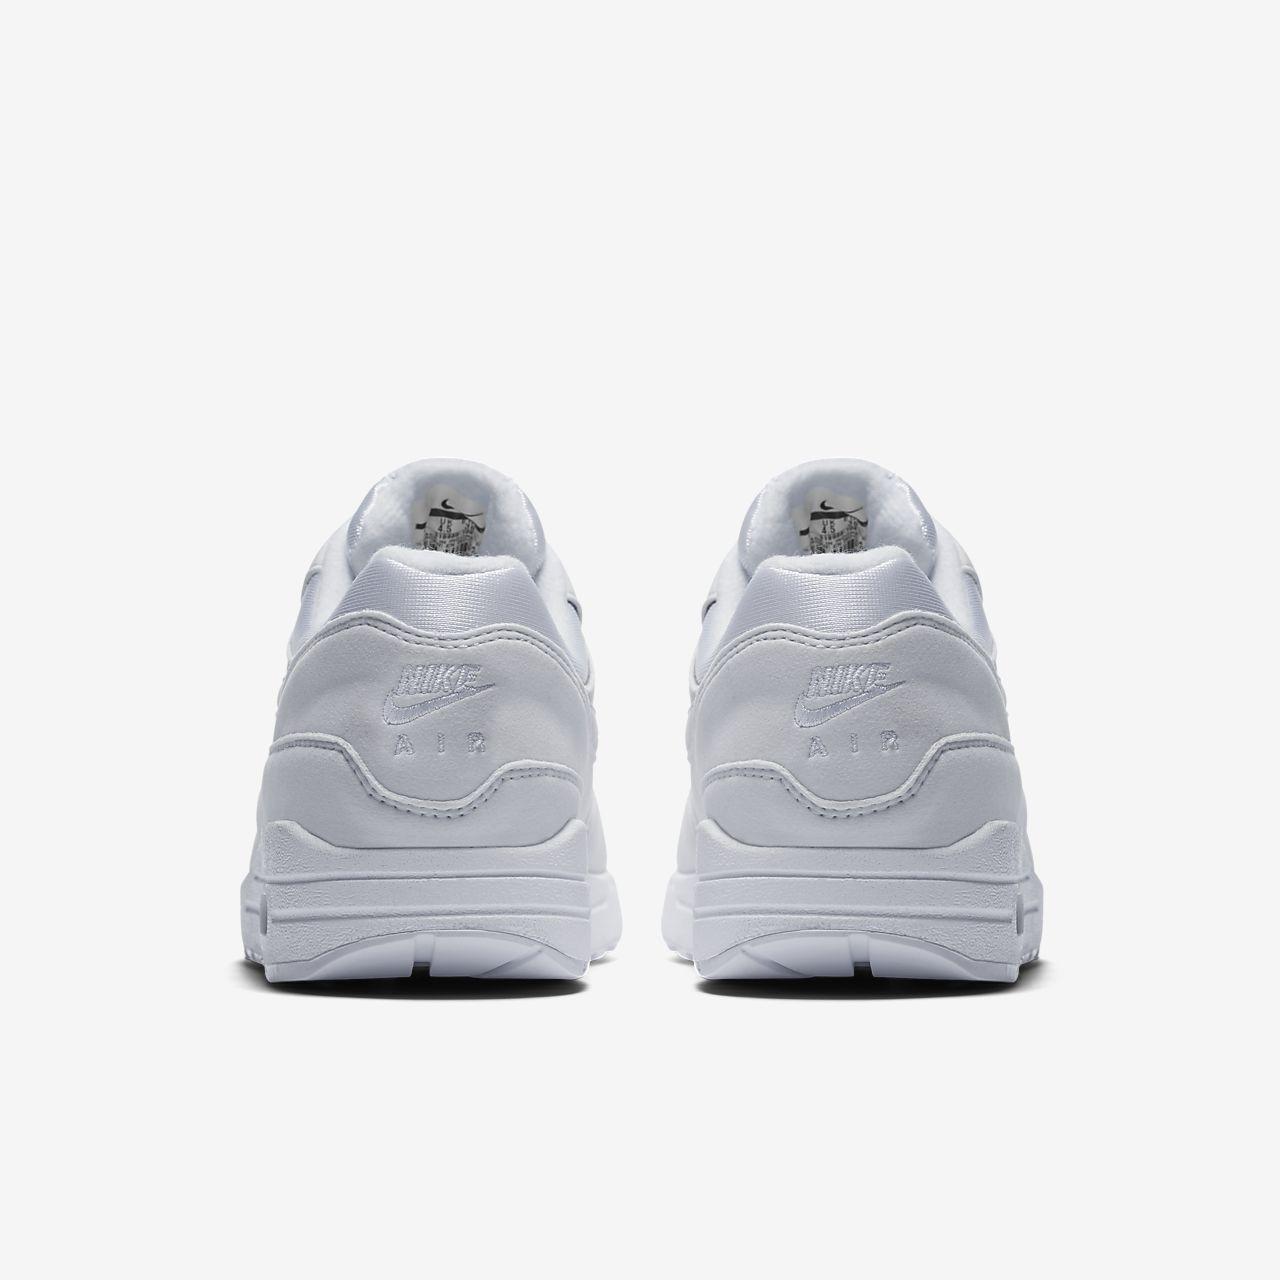 new product 812c5 5b718 ... Nike Air Max 1 Women s Shoe